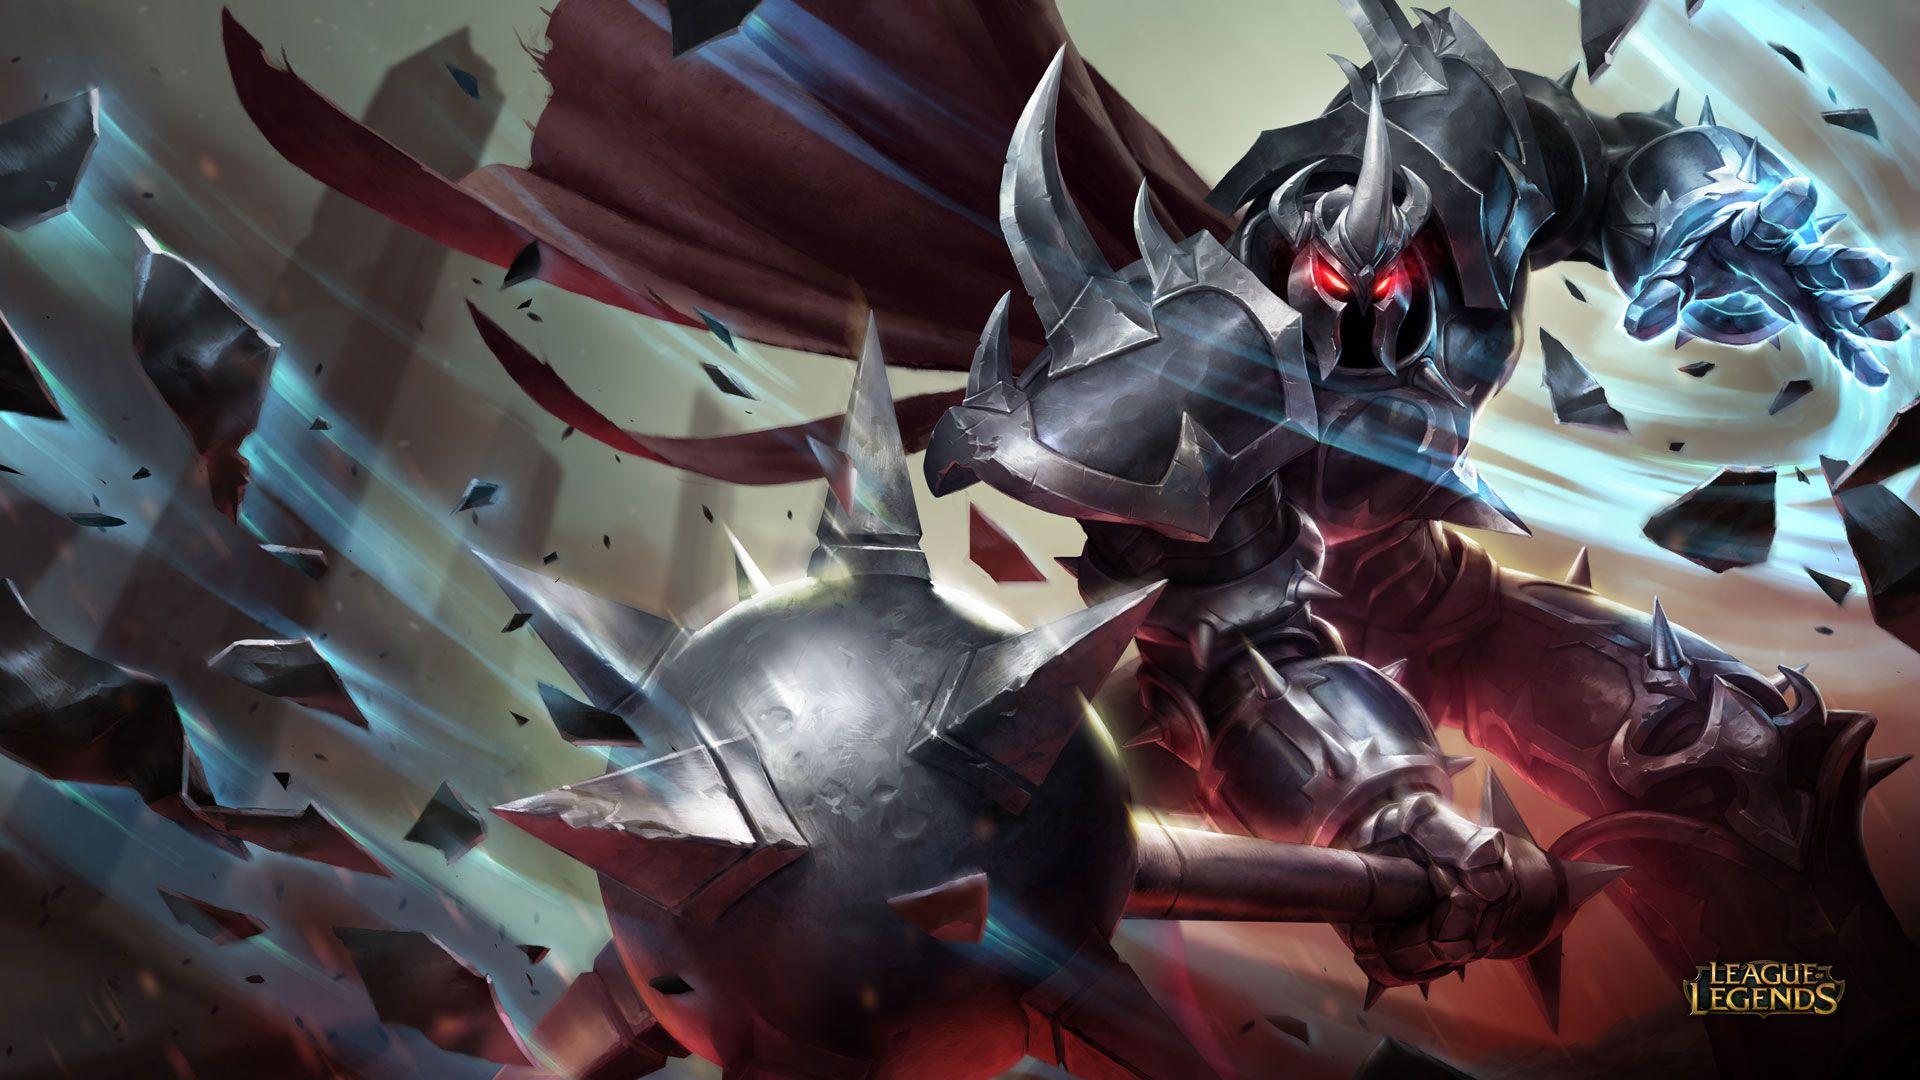 Mordekaiser - League of Legends Wallpapers